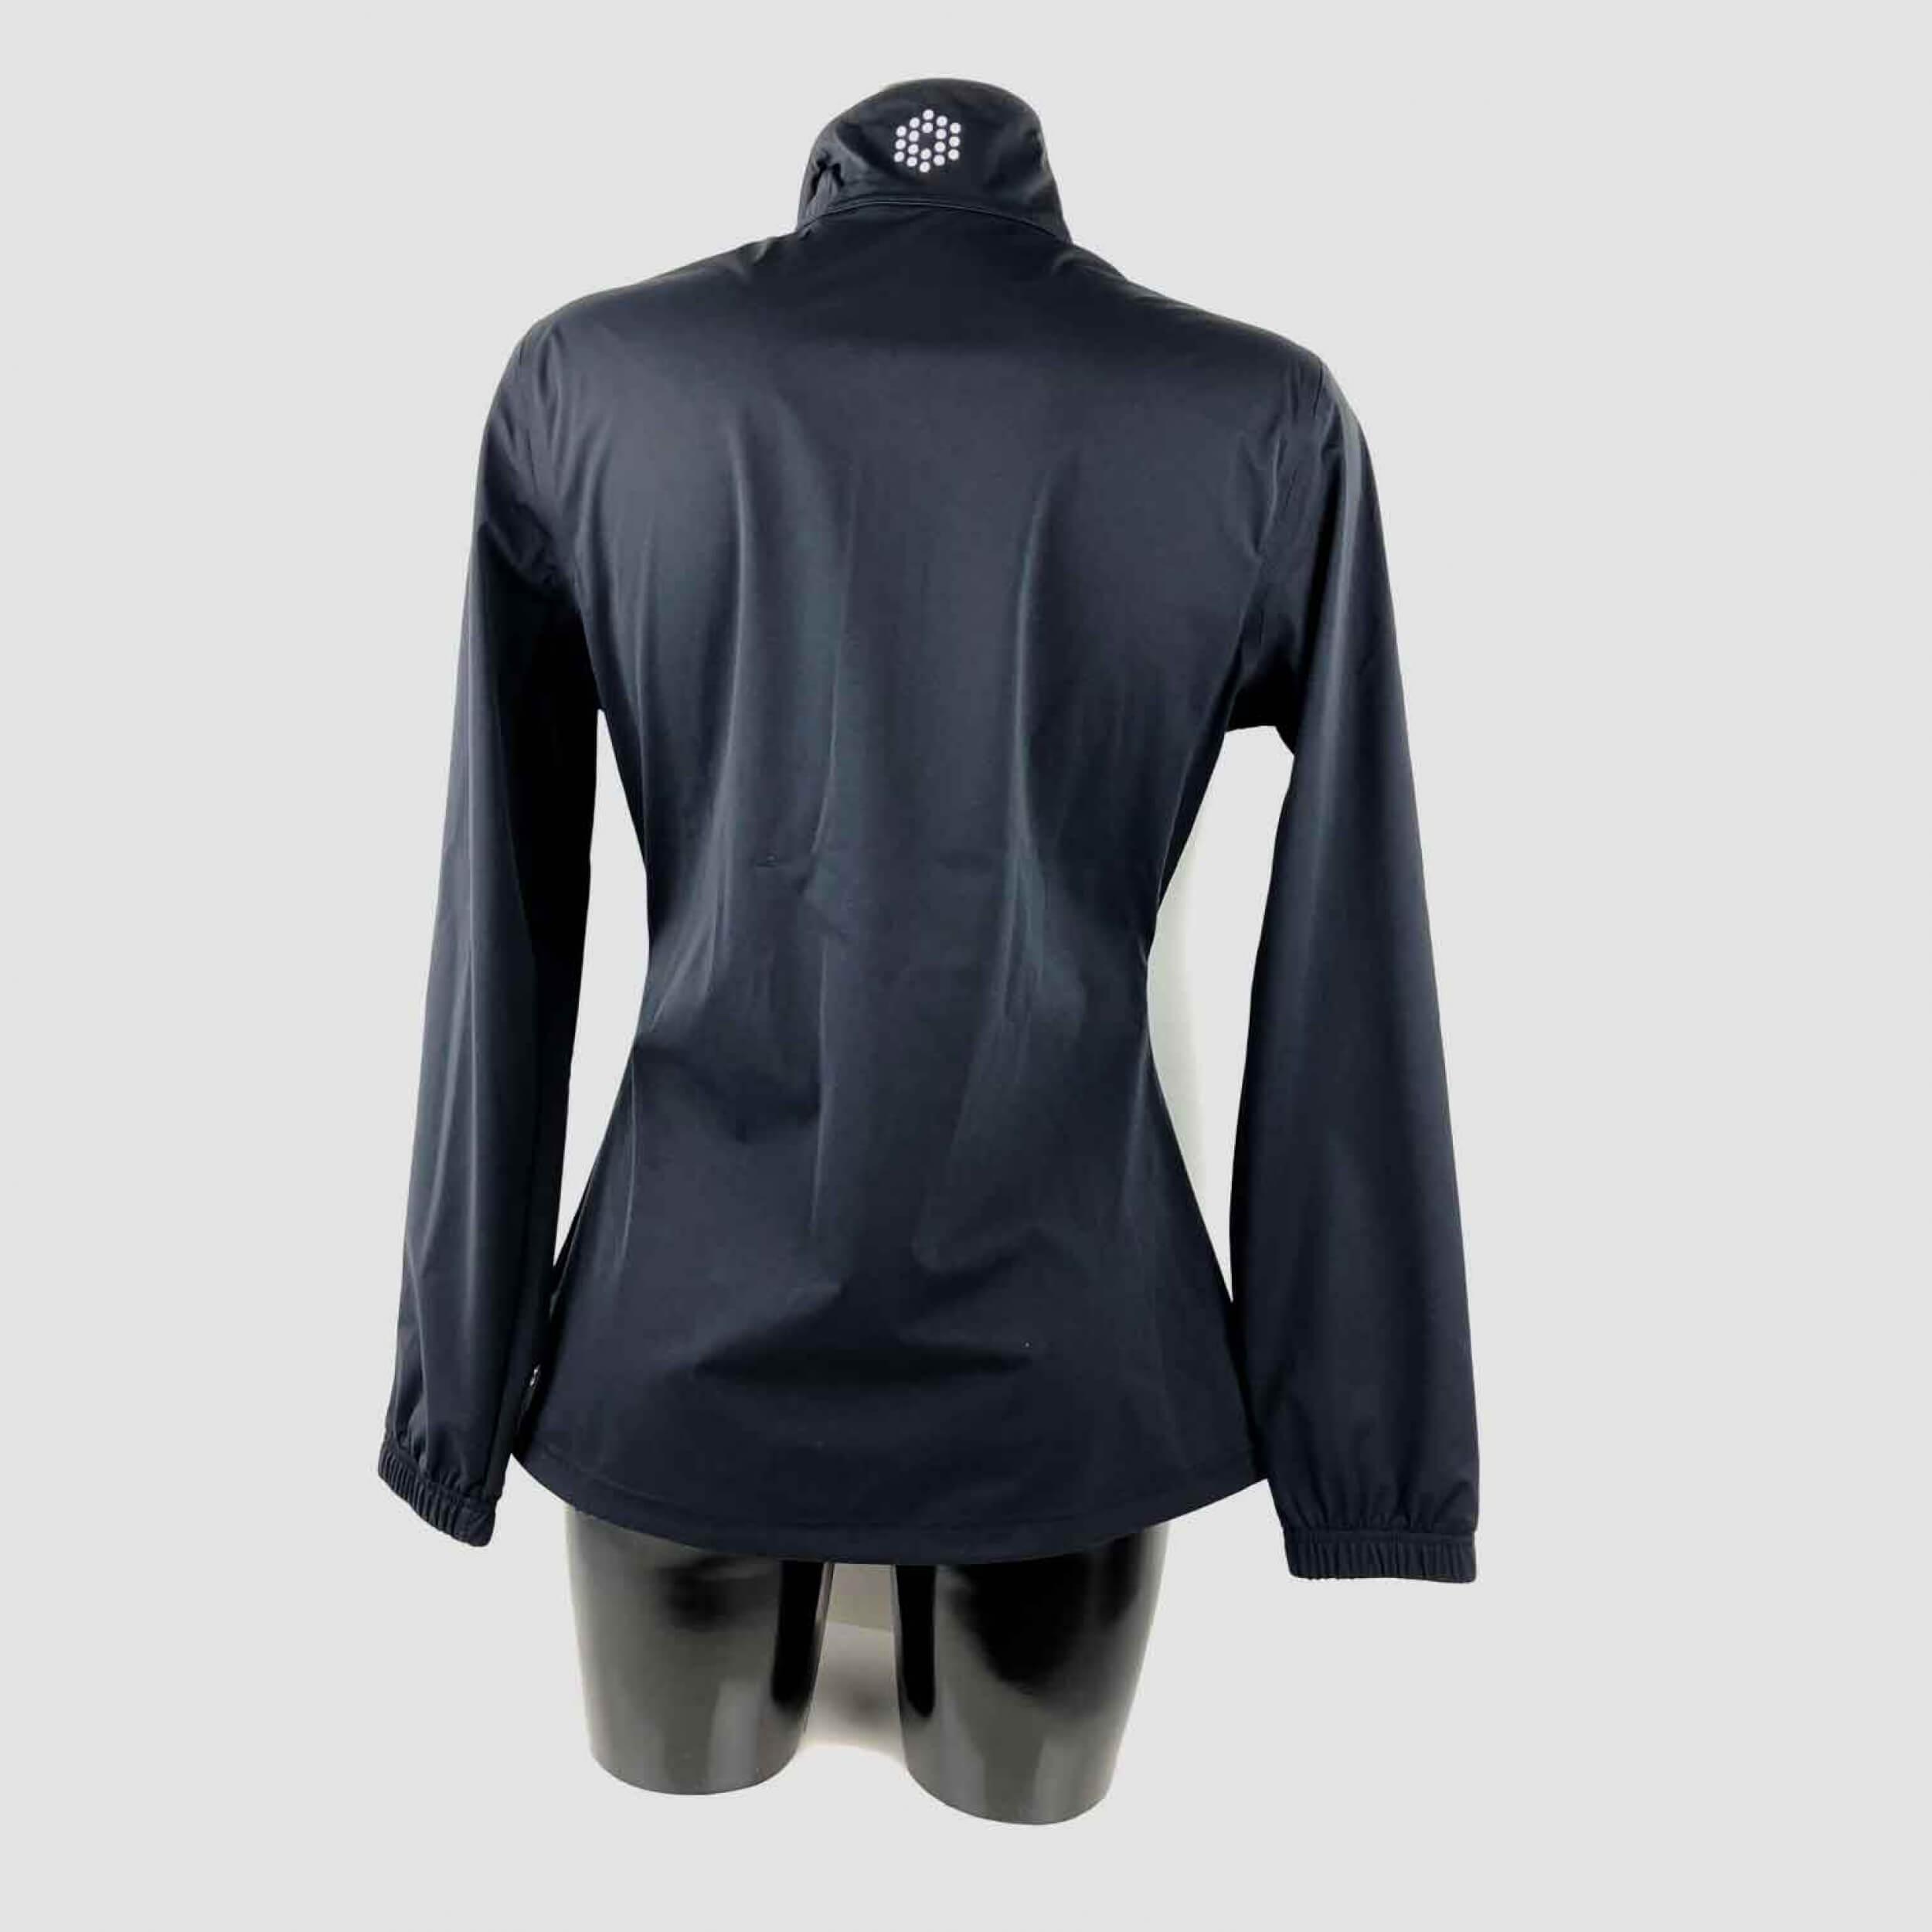 3477daf8680a Puma Golf Ladies Wind Jacket Black 01 Gr.36 New 4056205624806